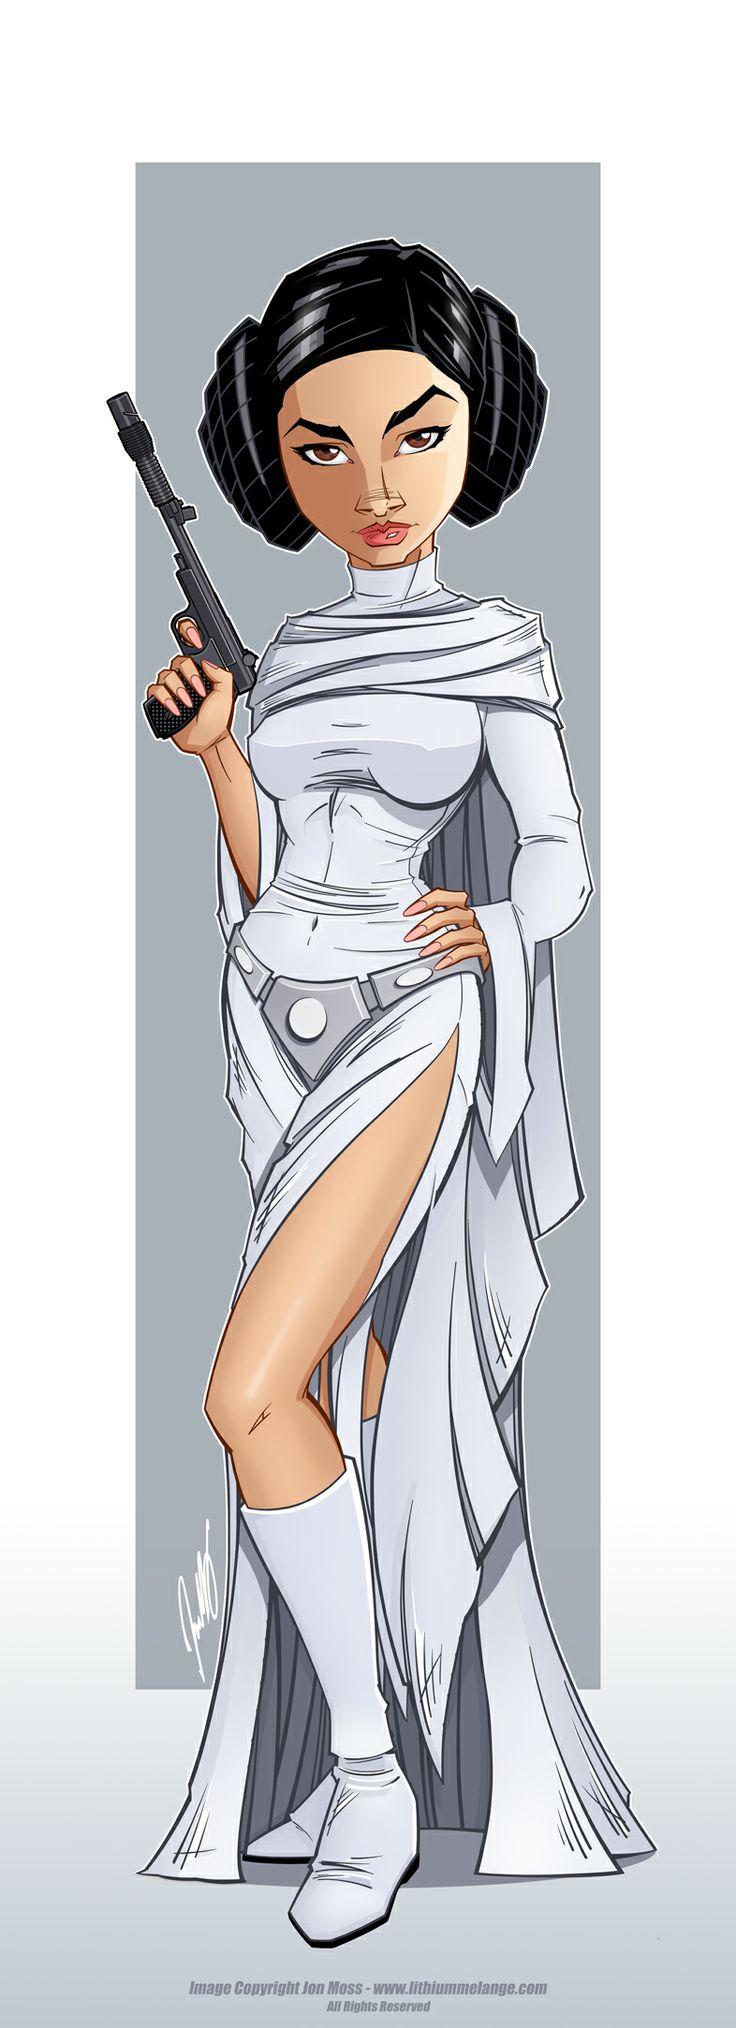 Leia Anime Cartoons 17c24610